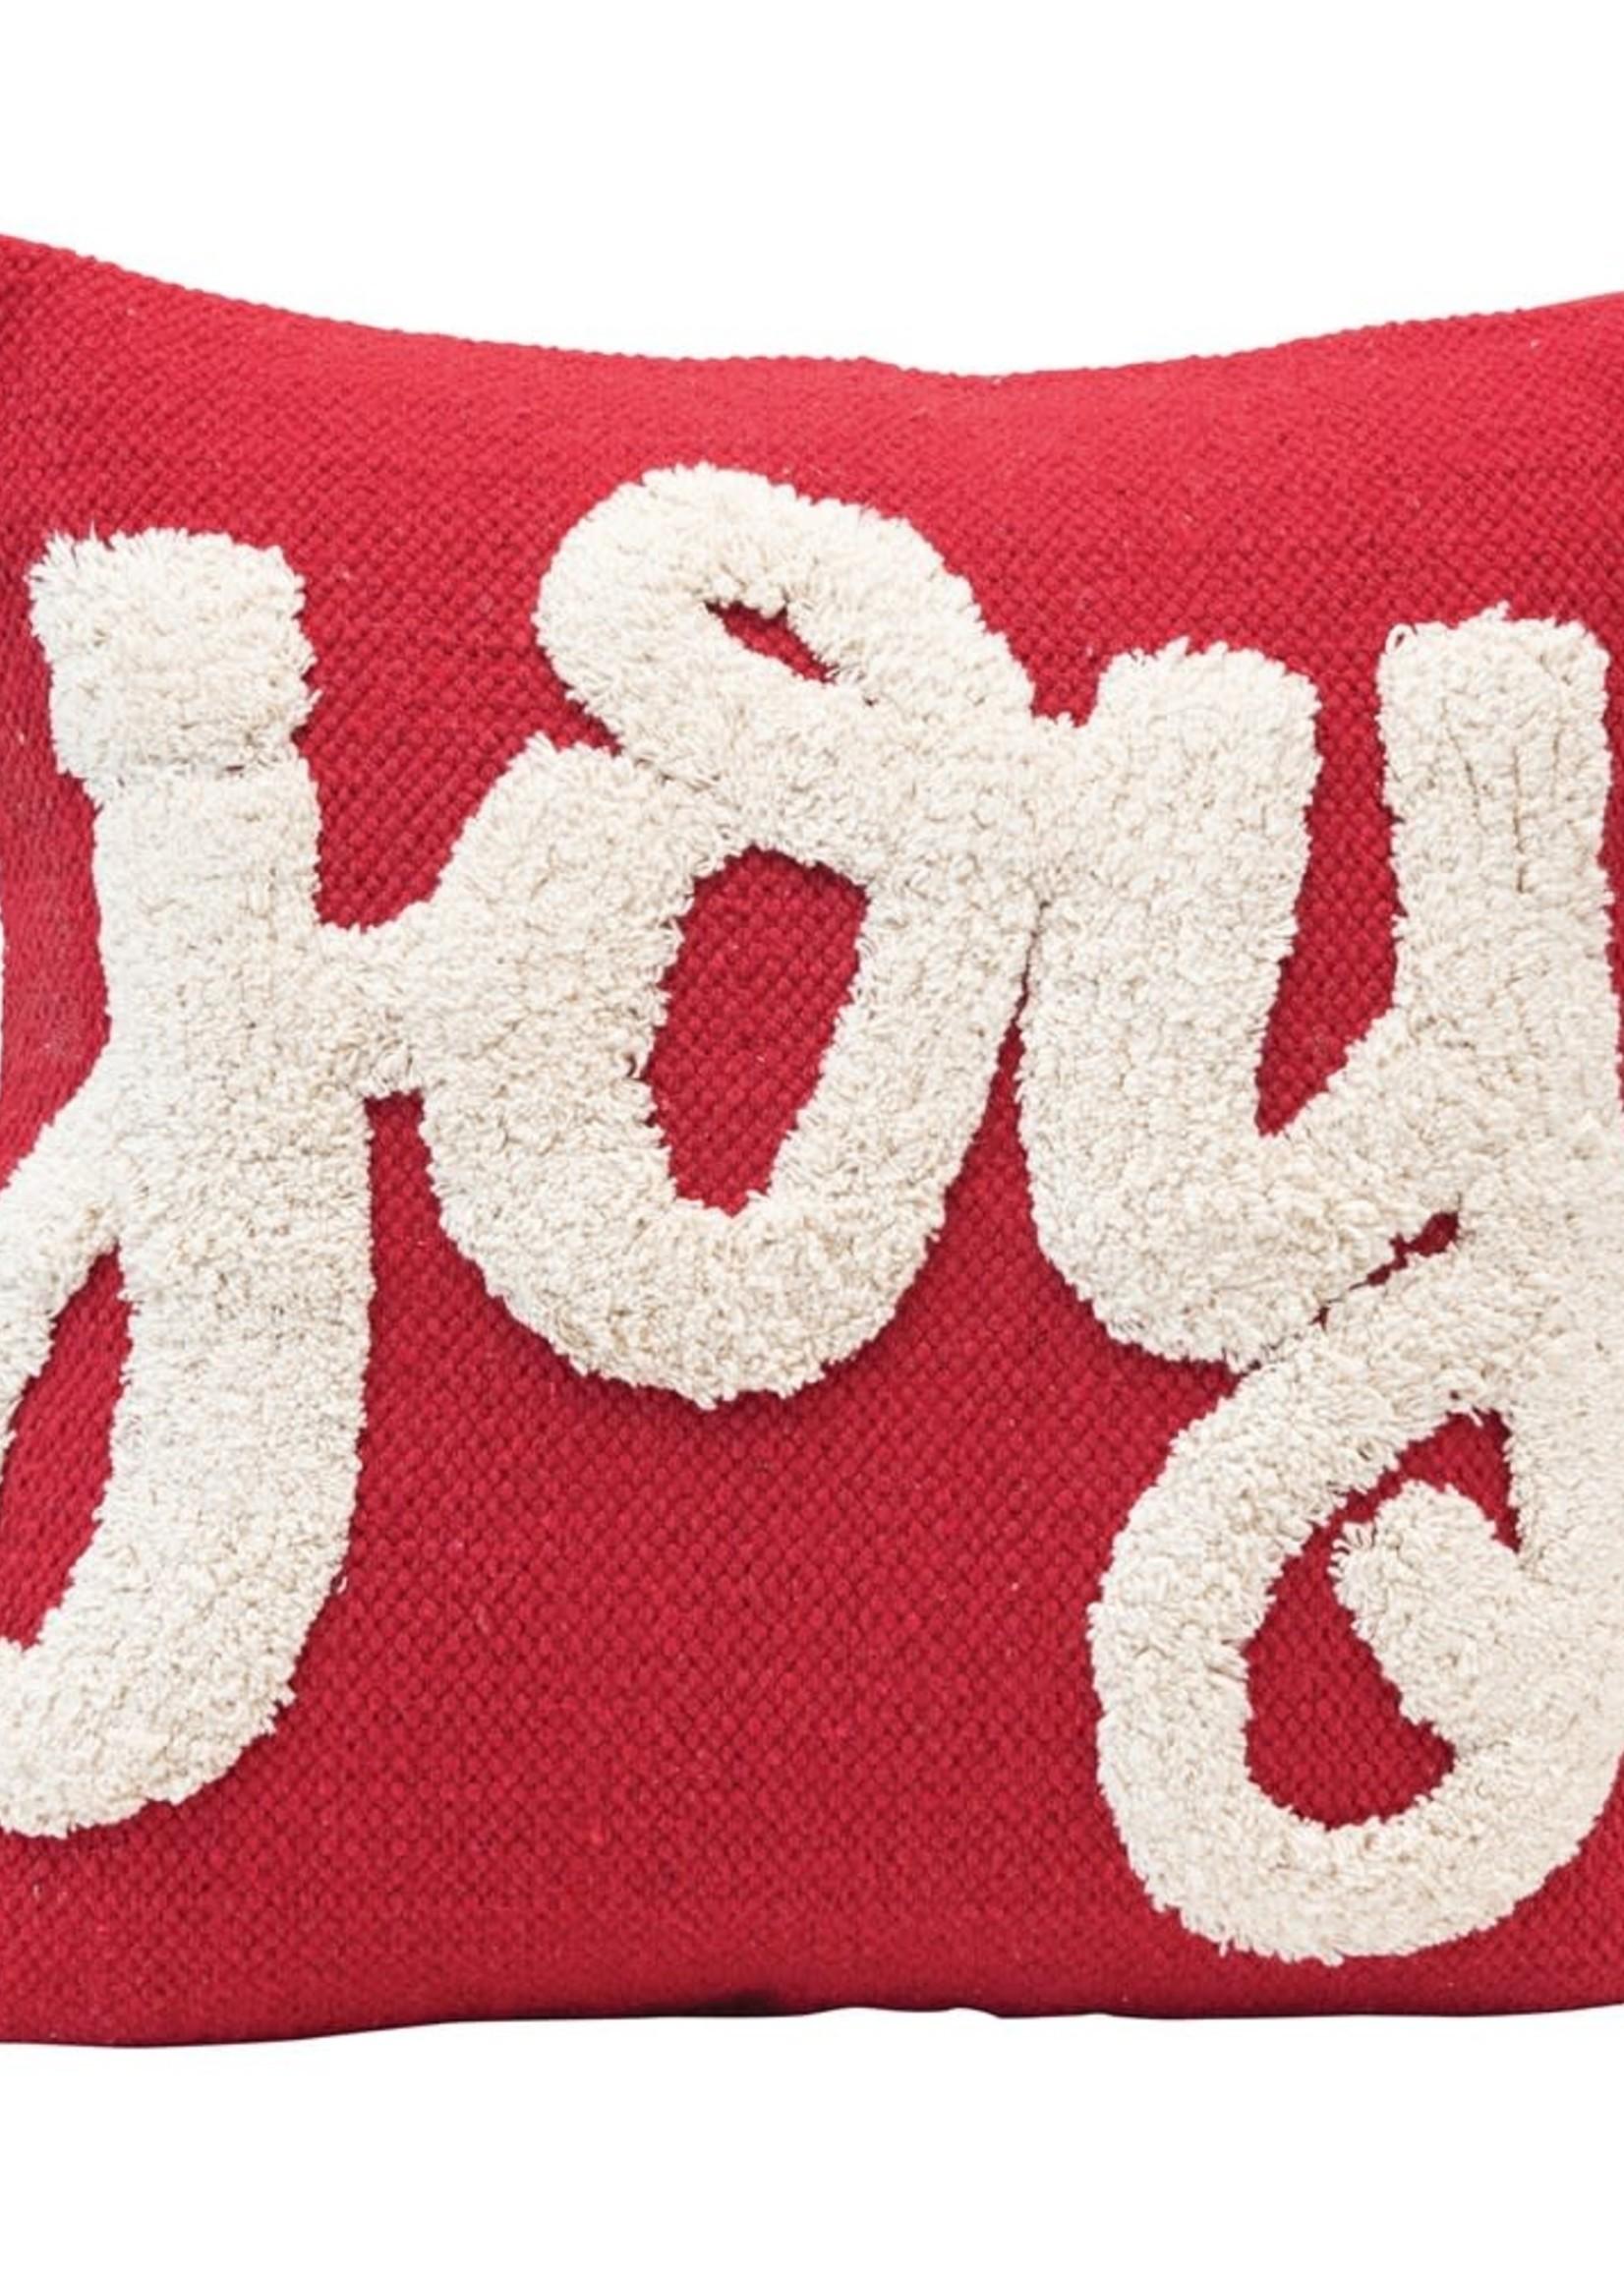 "18"" Square Cotton Tufted Pillow ""Joy"", Red & White"